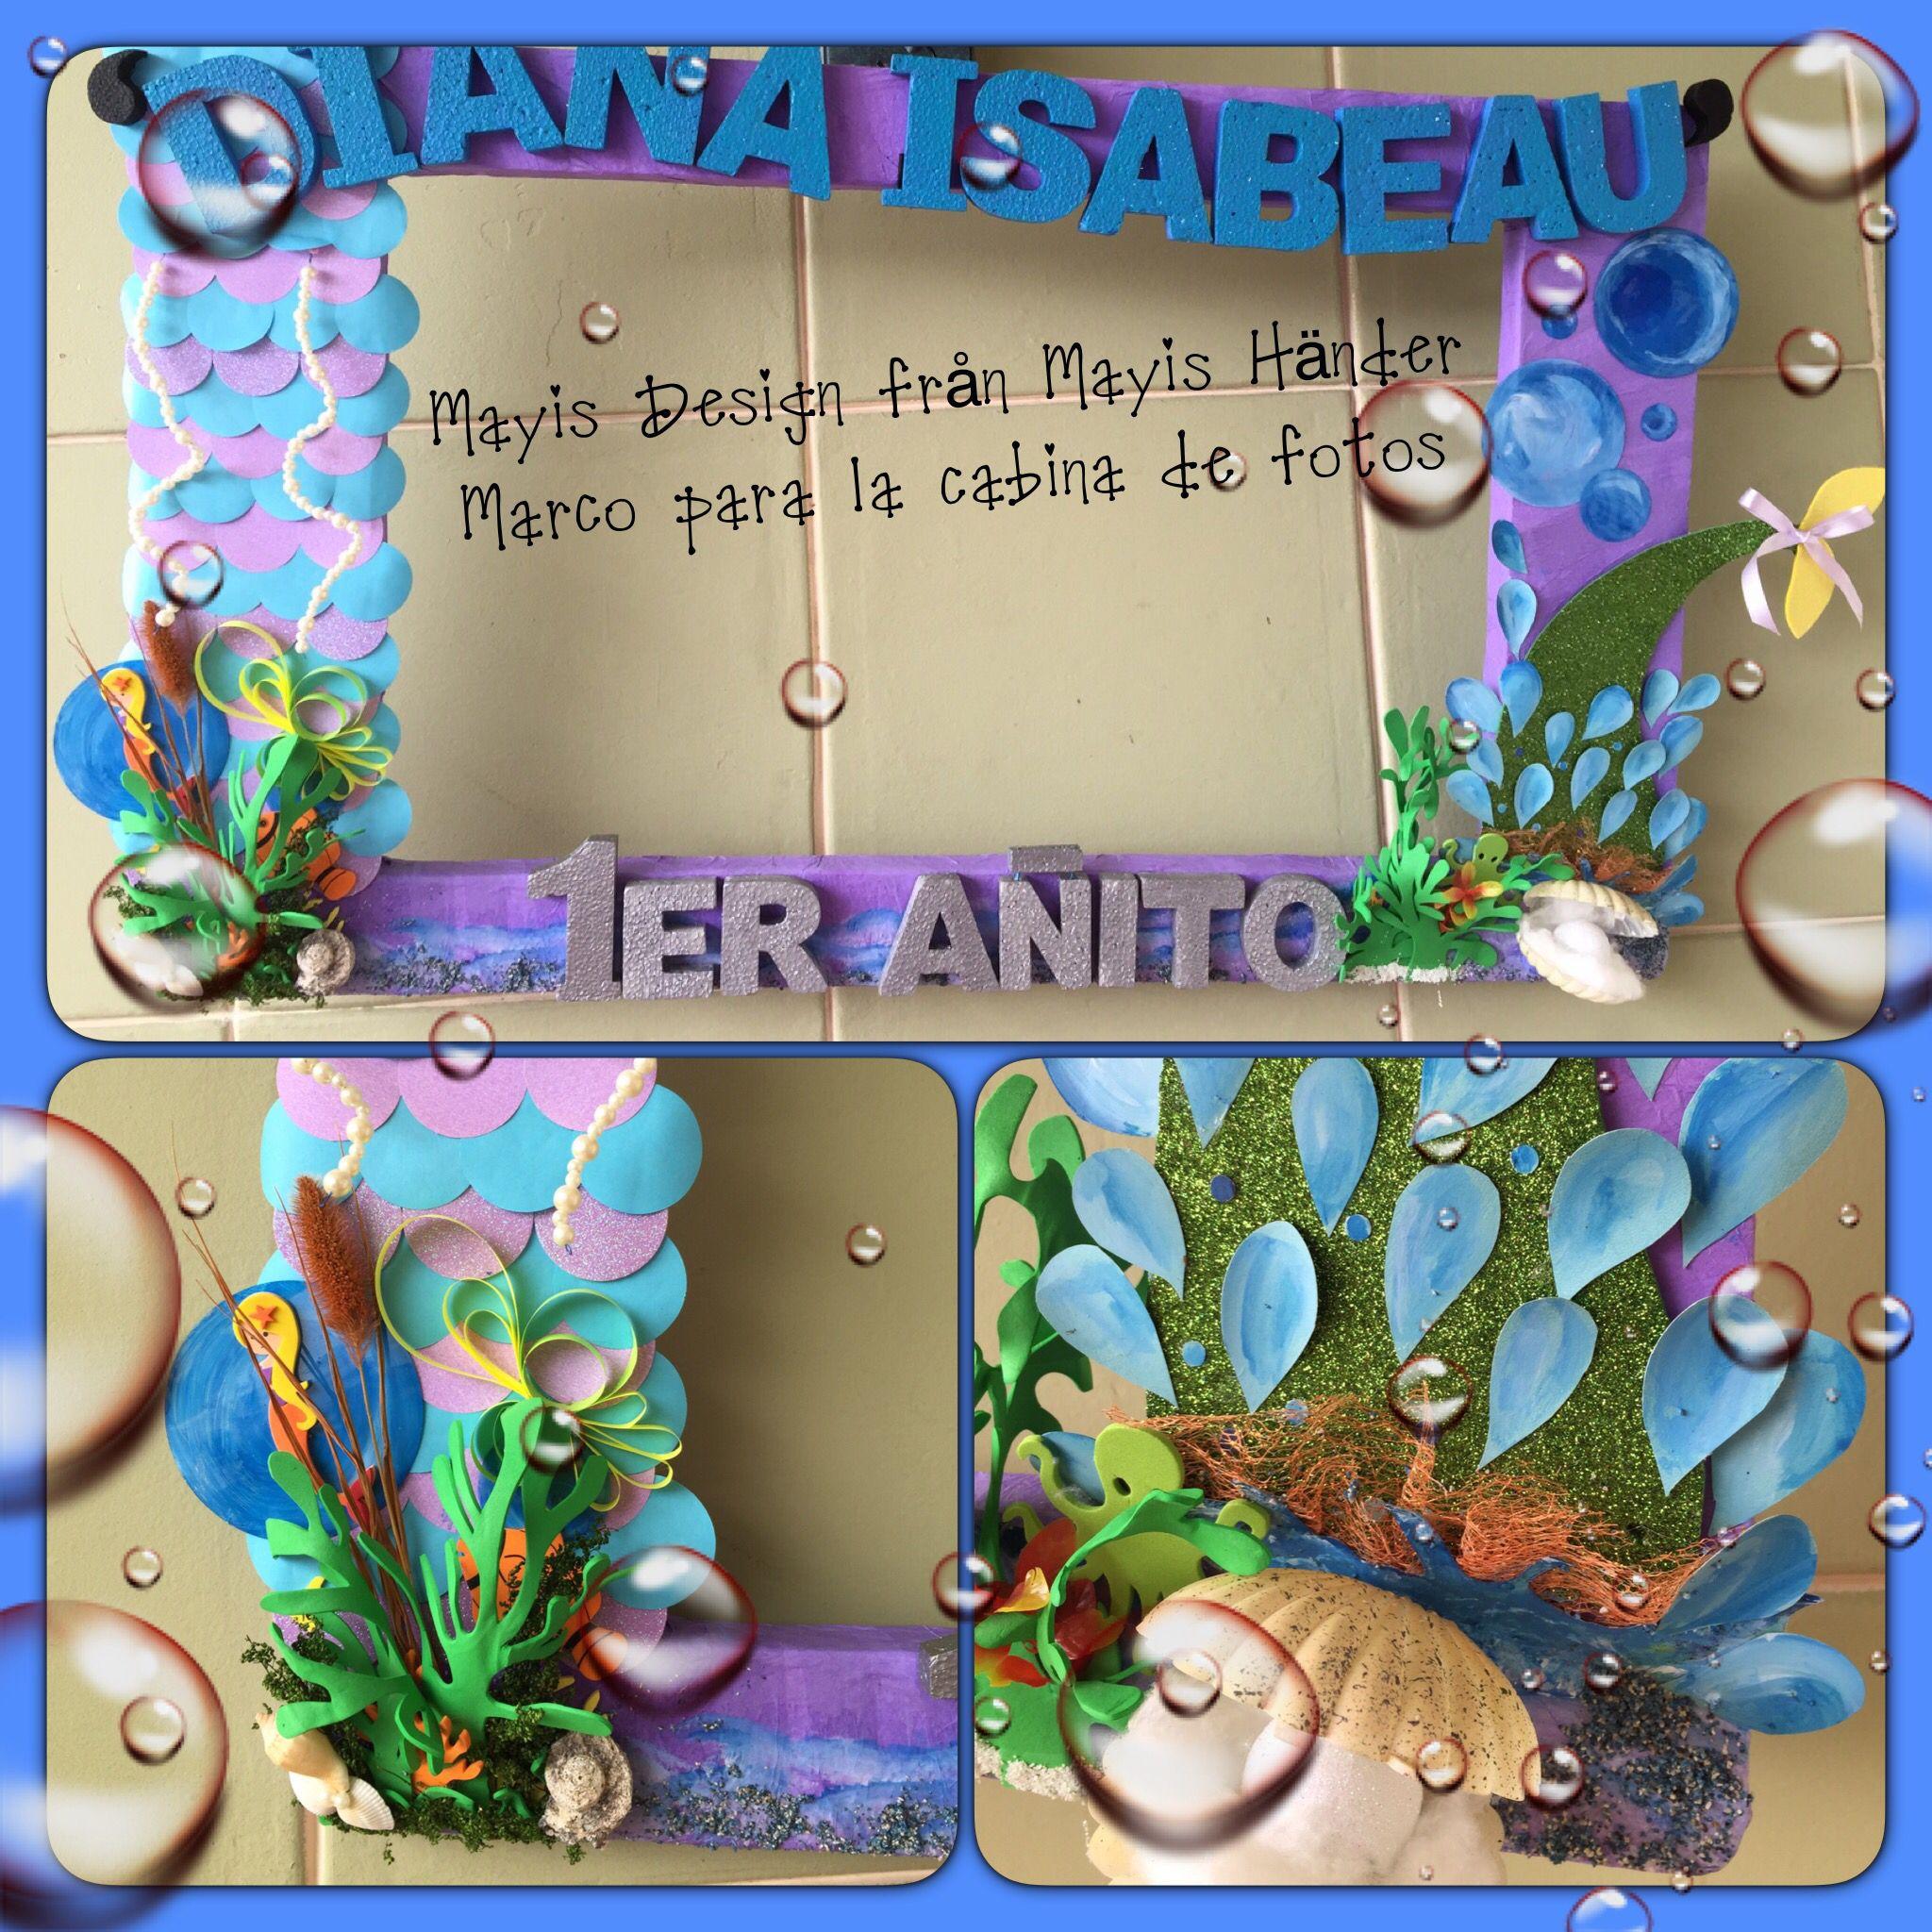 Photo Booth Frammes Marcos para la Cabina de fotos | Ideas ...